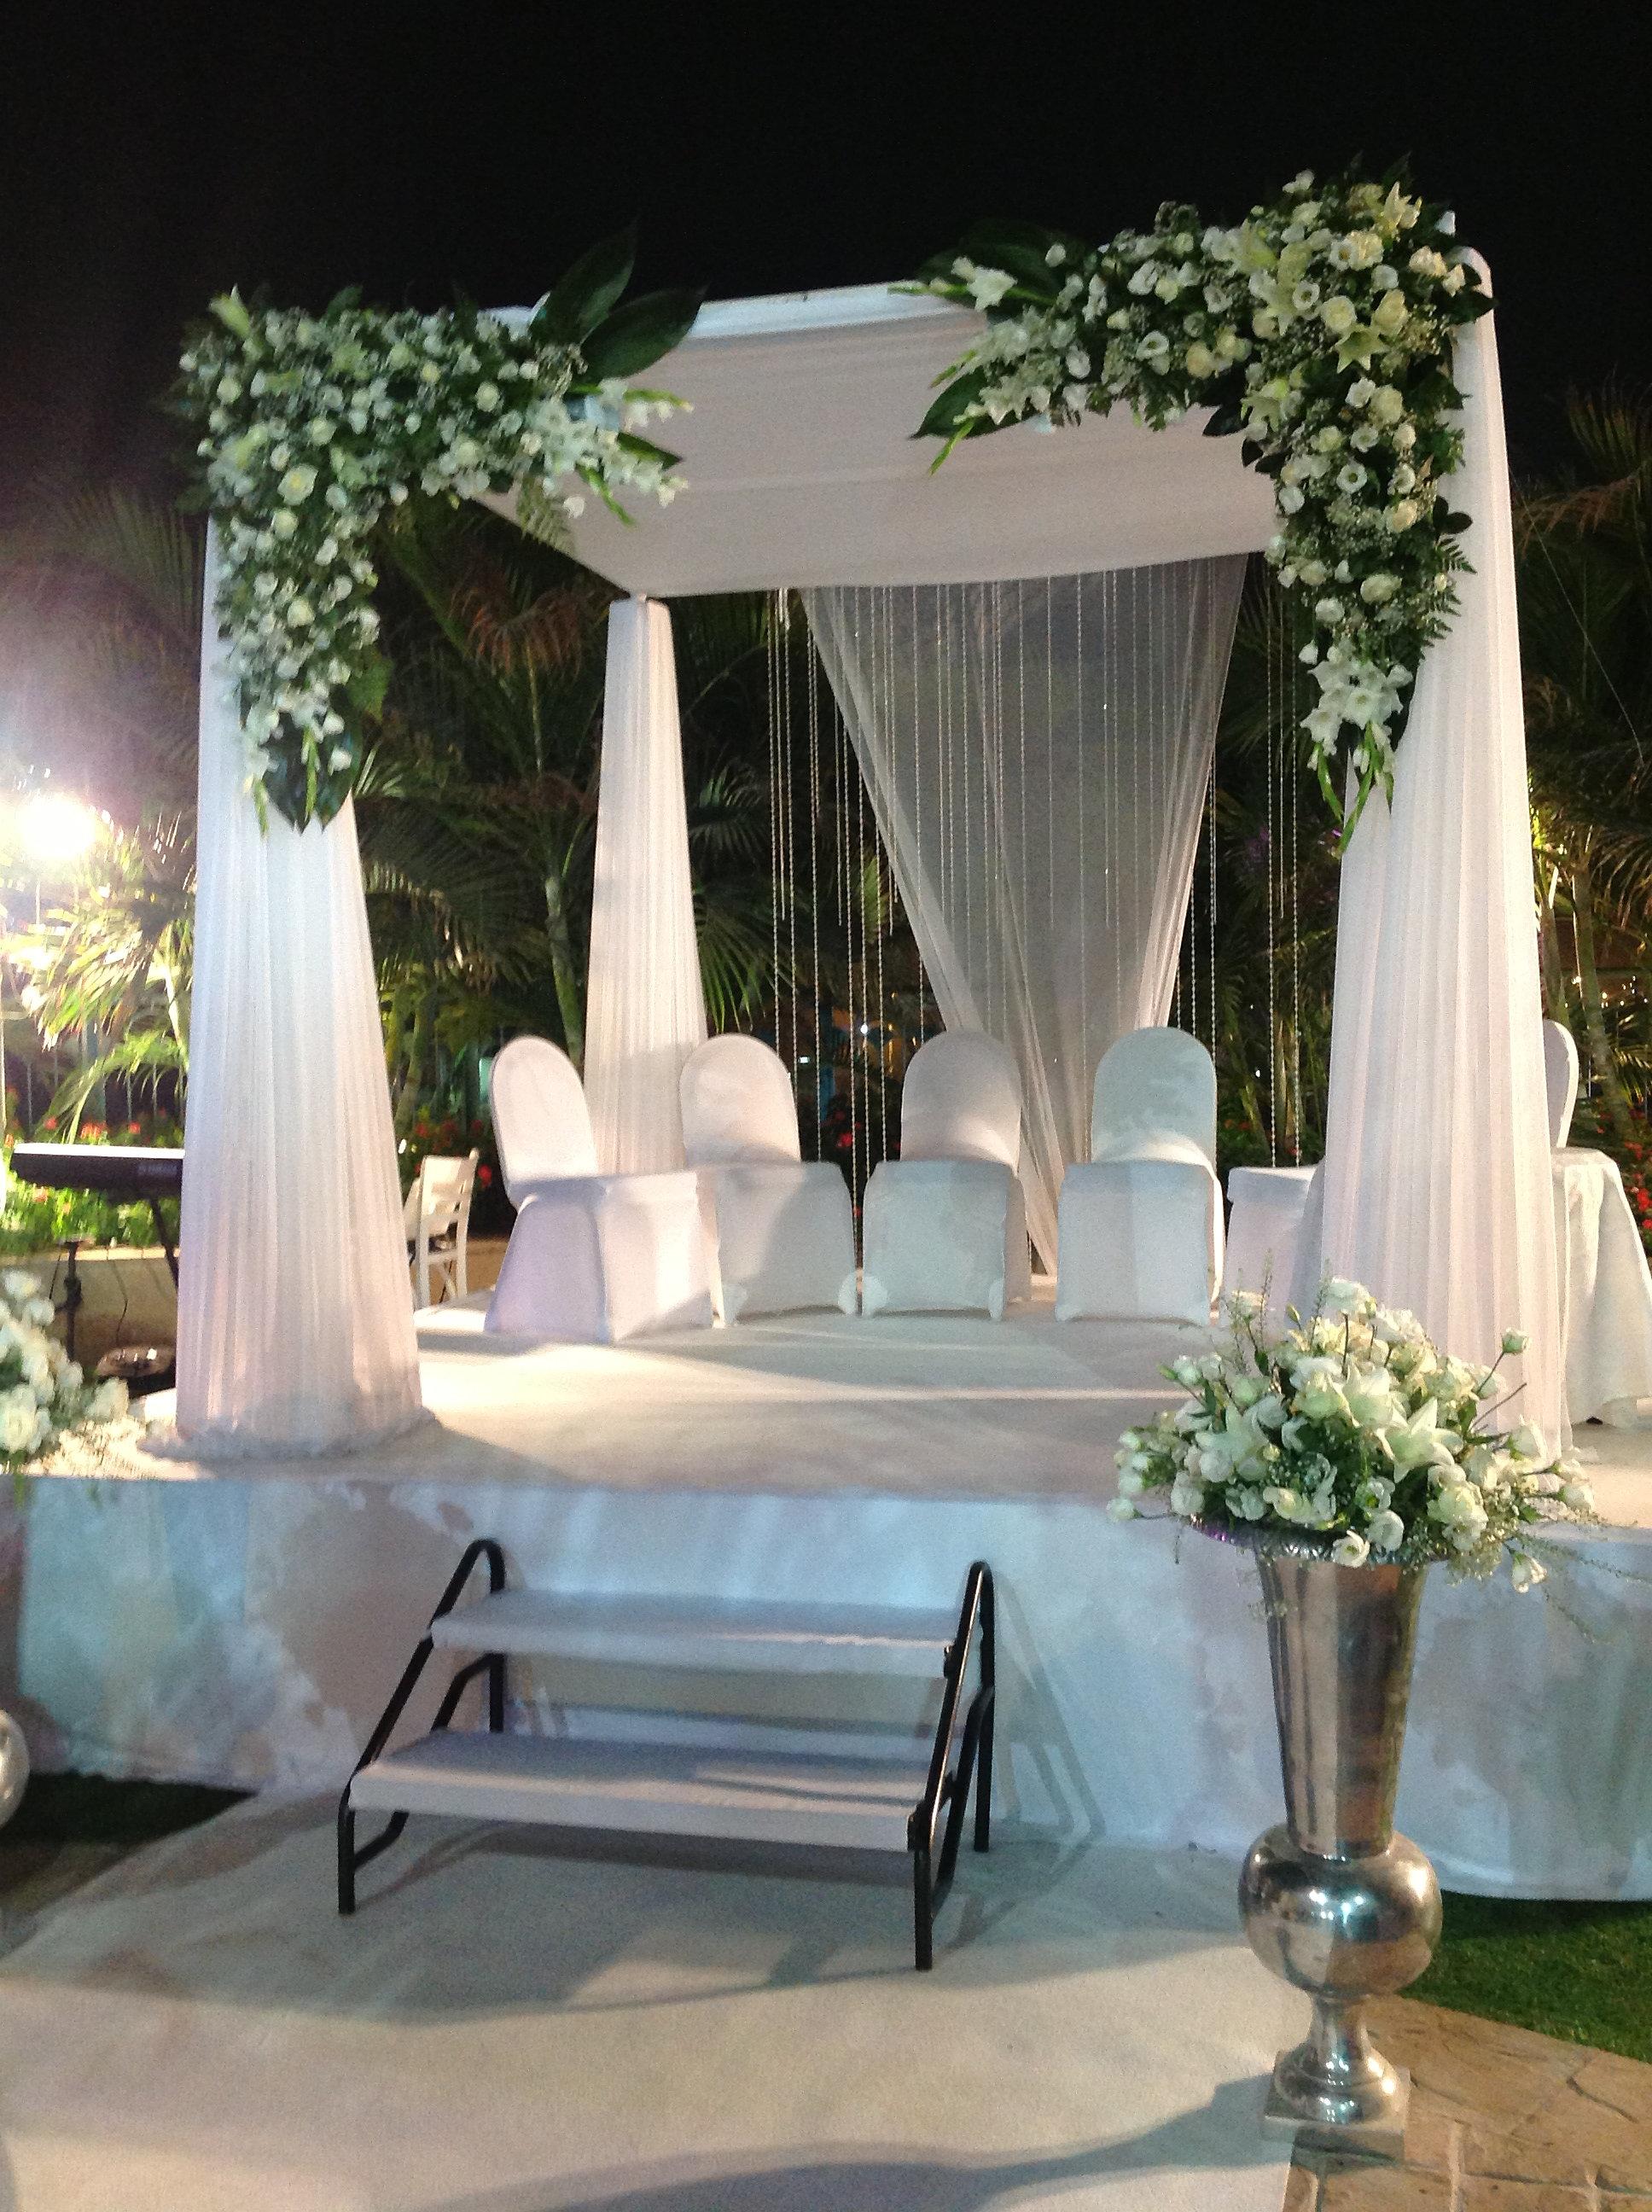 israel pour tous voyage israel mariage israel eilat - Mariage Eilat